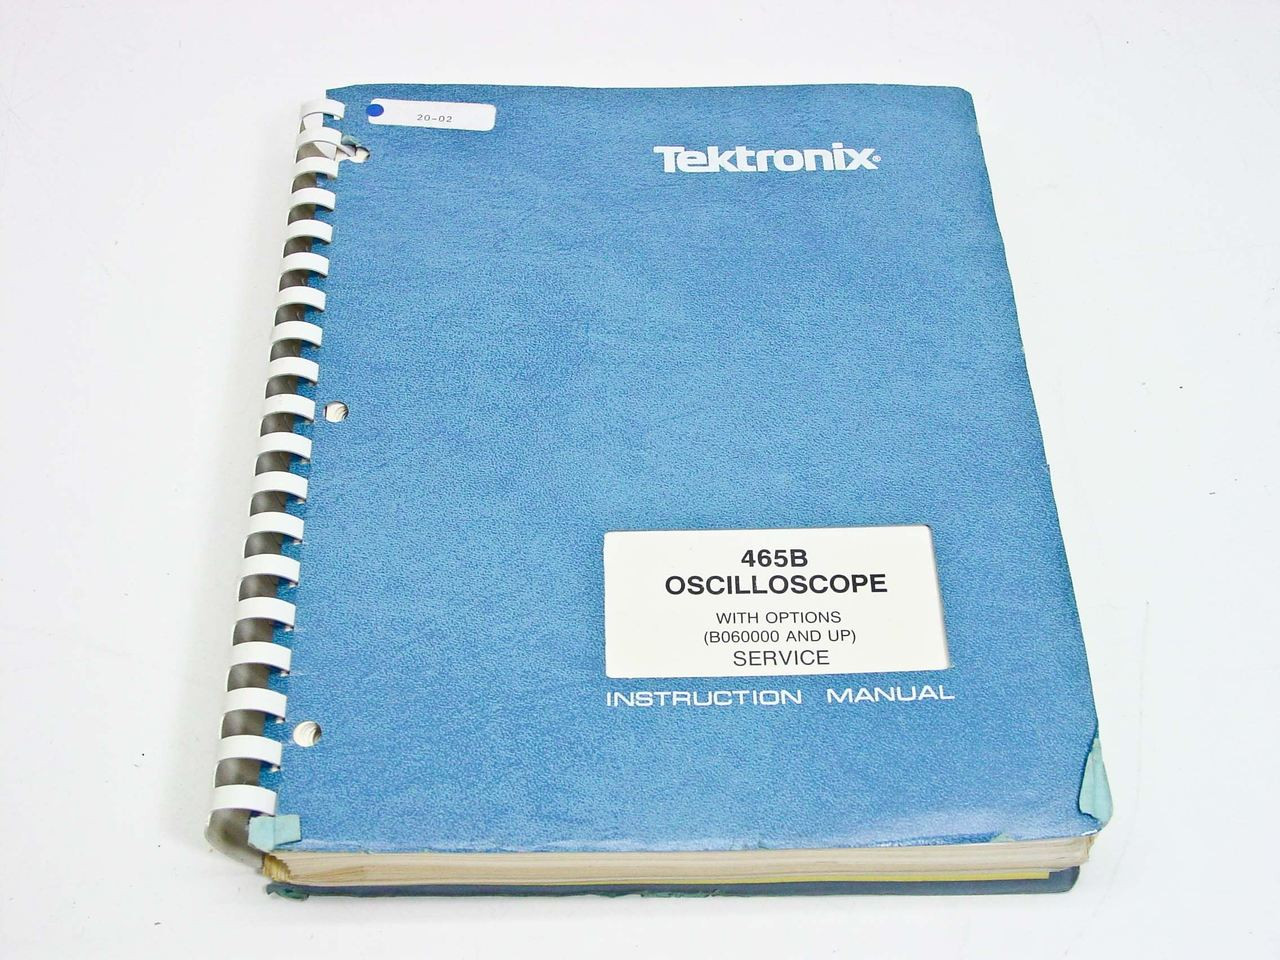 tektronix 465b with opt service manual recycledgoods com rh recycledgoods com tektronix oscilloscope 465 manual tektronix 465b manual free download